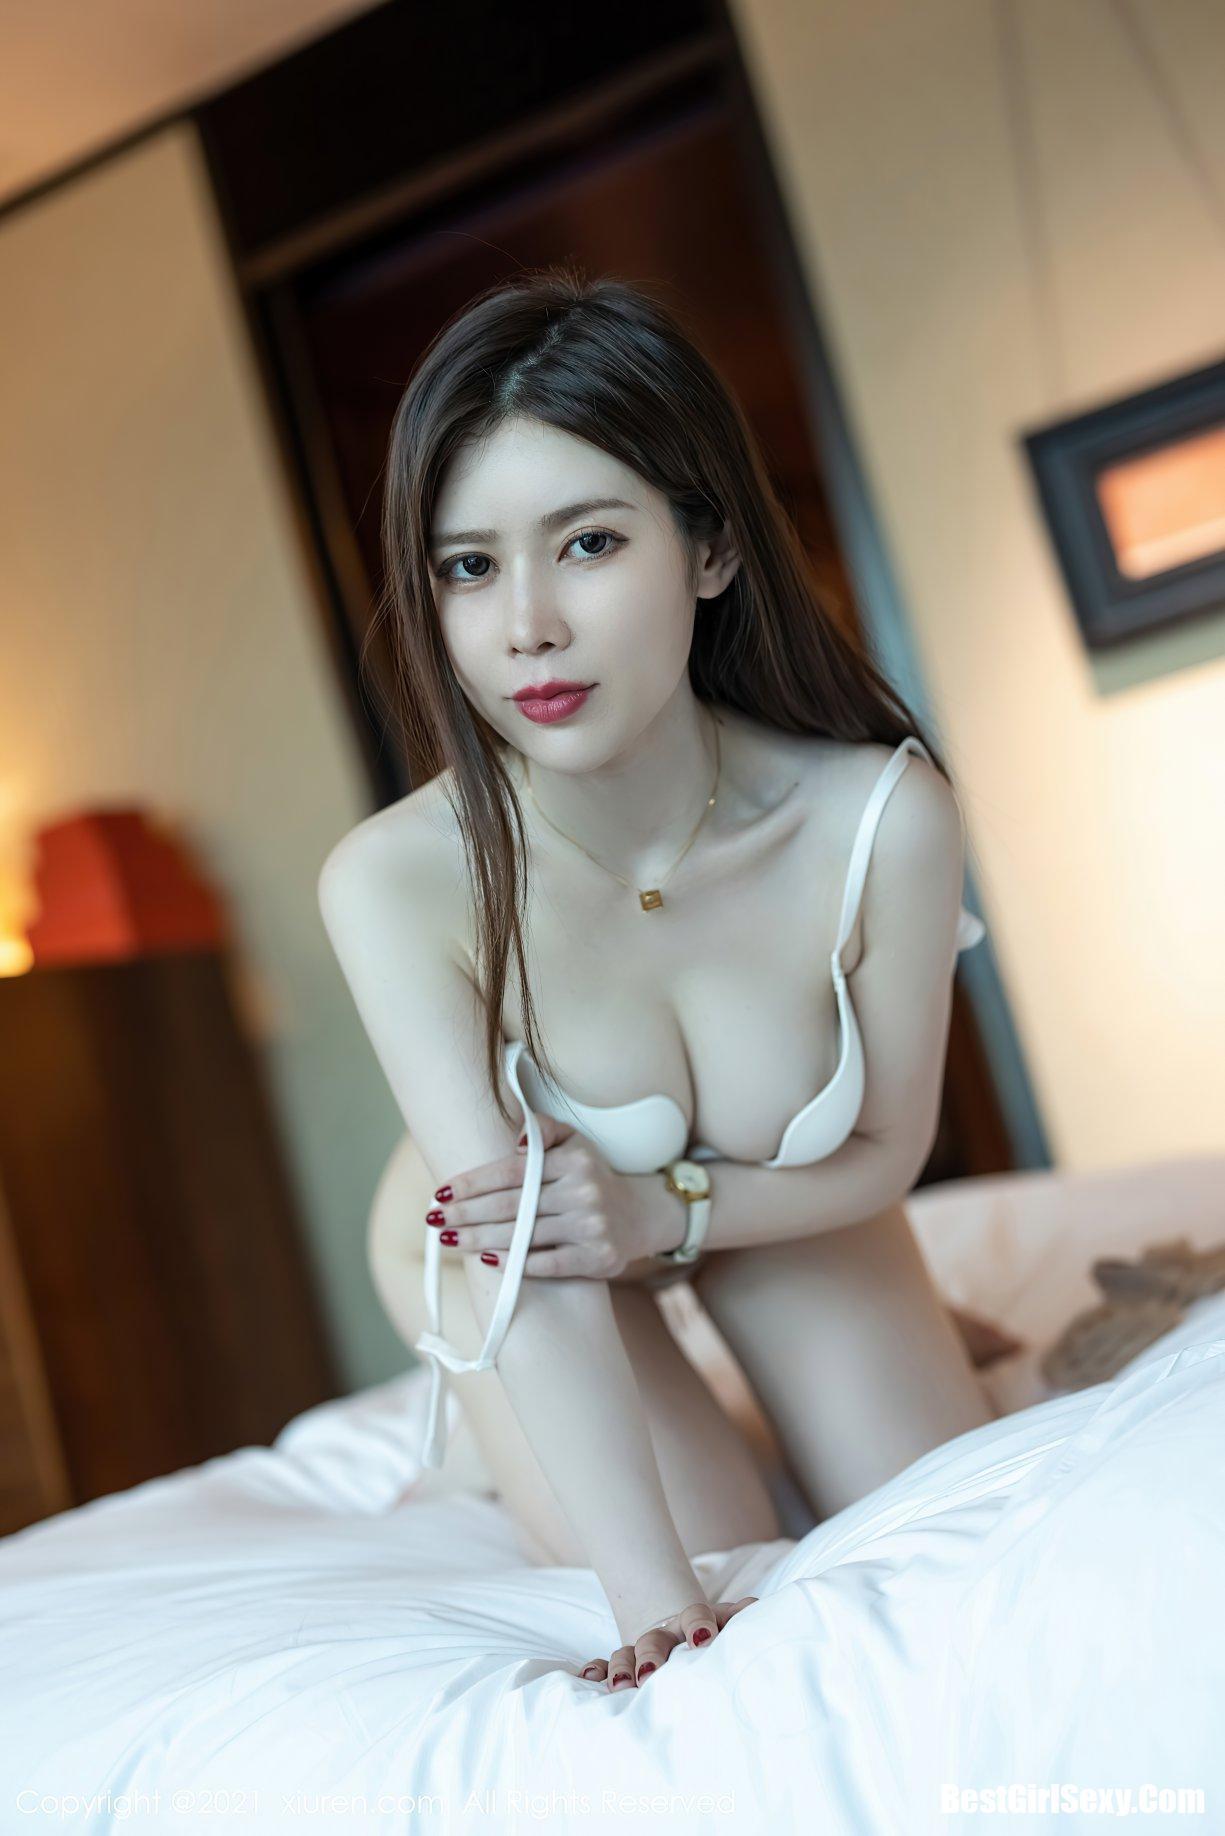 吴雪瑶, XiuRen秀人网 No.3783 Wu Xue Yao, XiuRen秀人网 No.3783, Wu Xue Yao